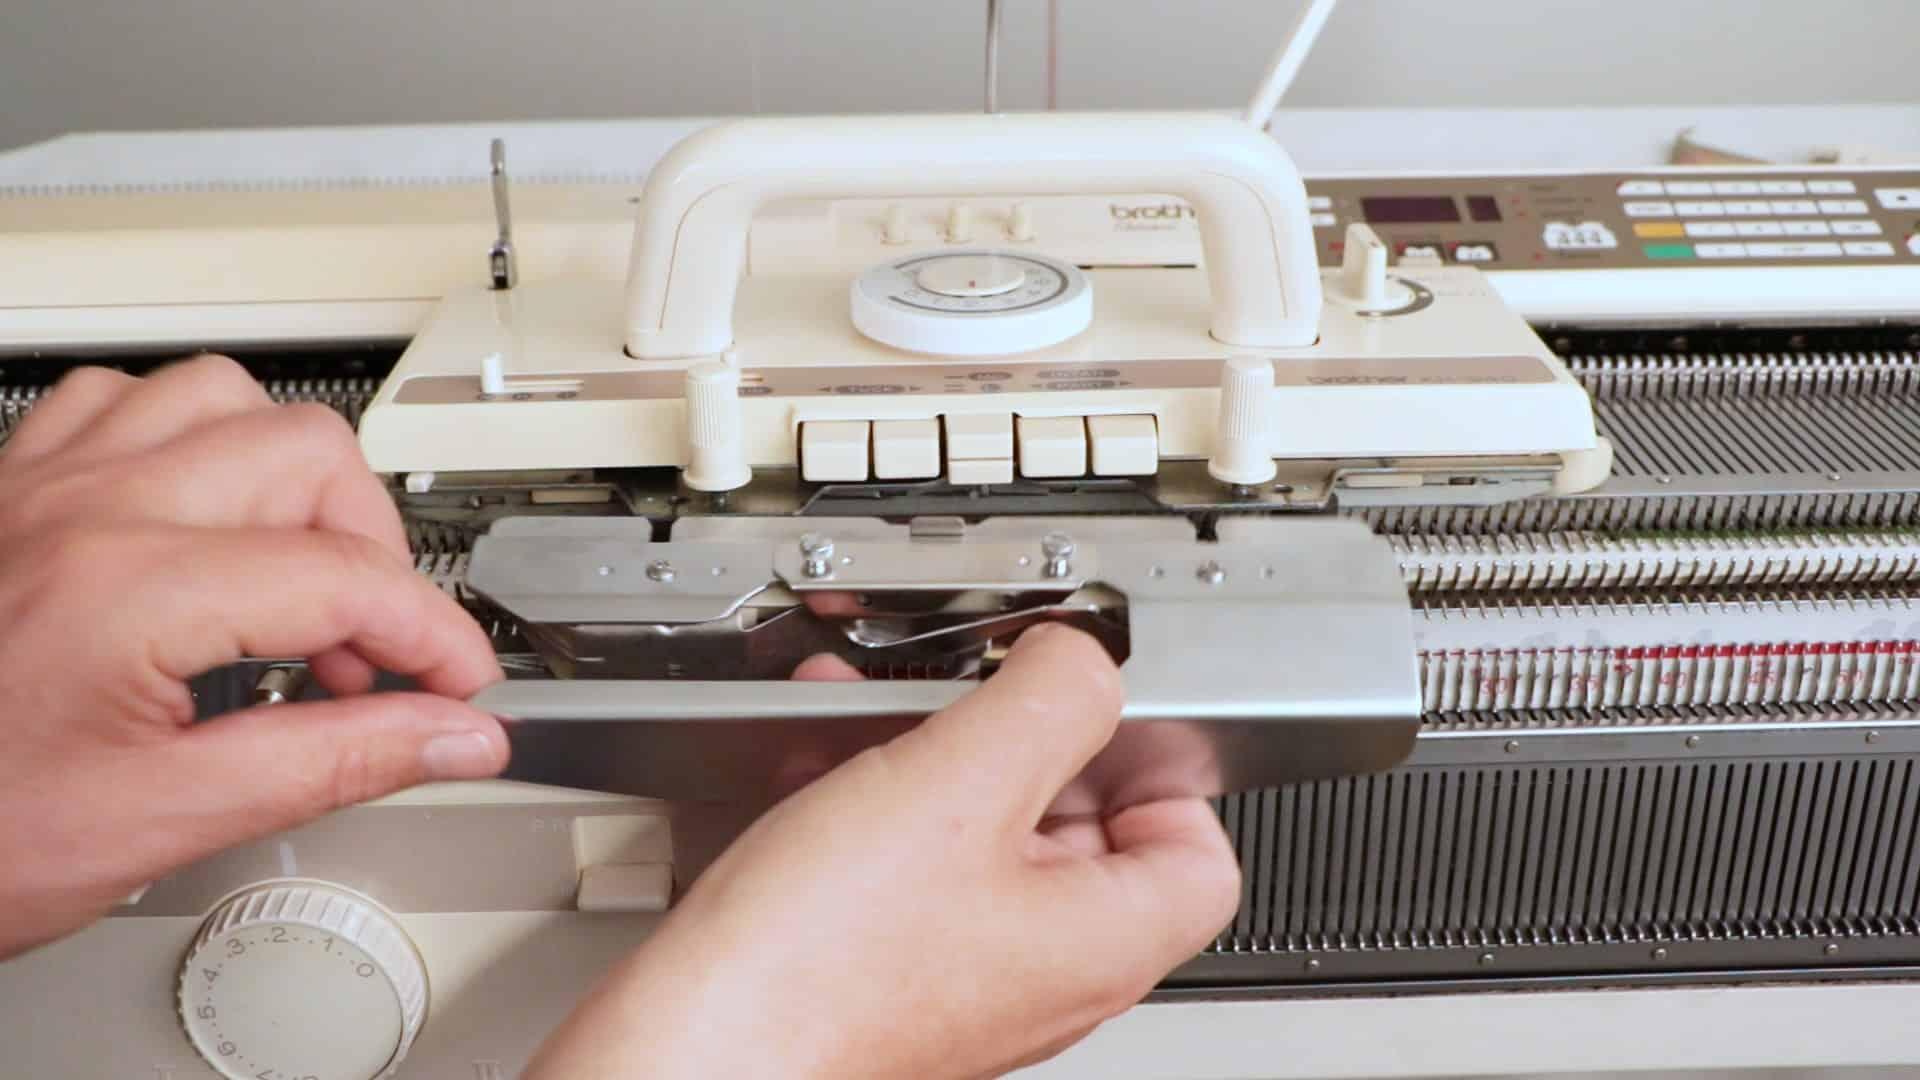 Vorschau Anbringen DB-Abstreifer